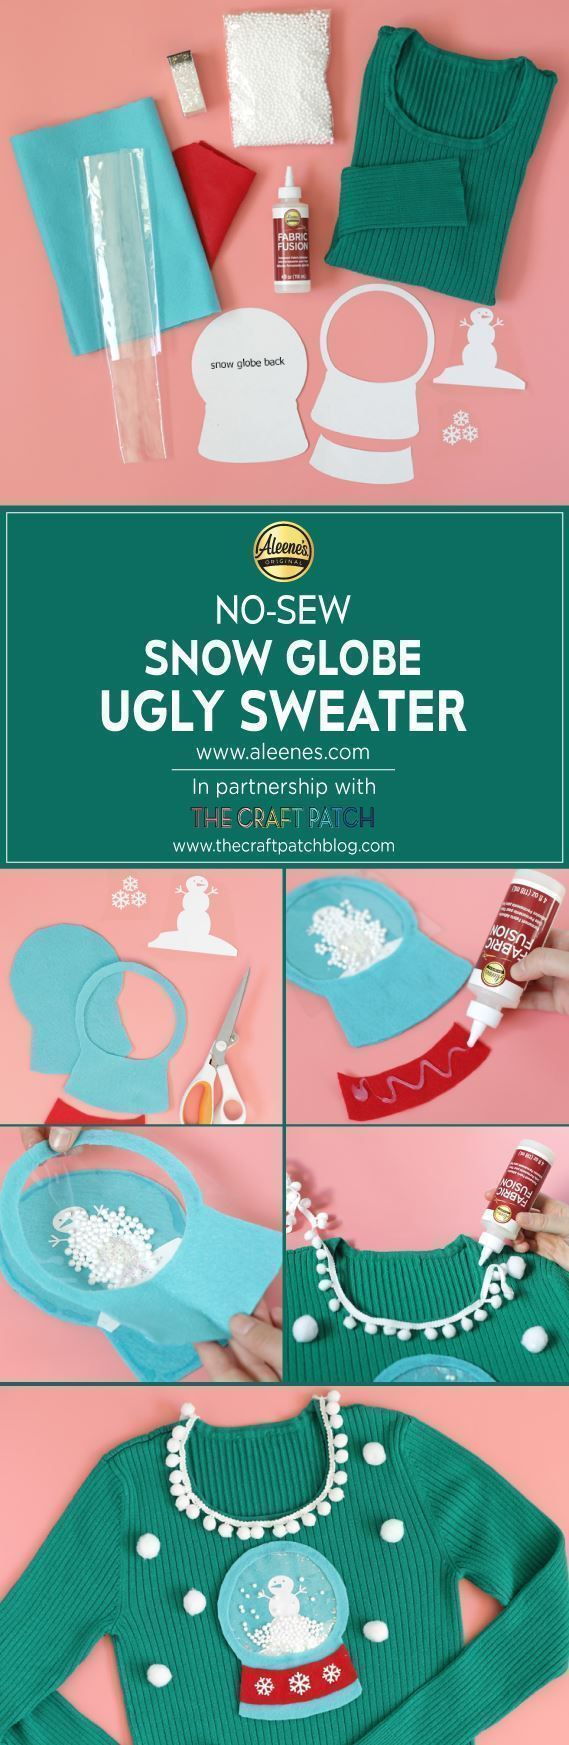 Aleene's No-Sew Snow Globe Ugly Sweater